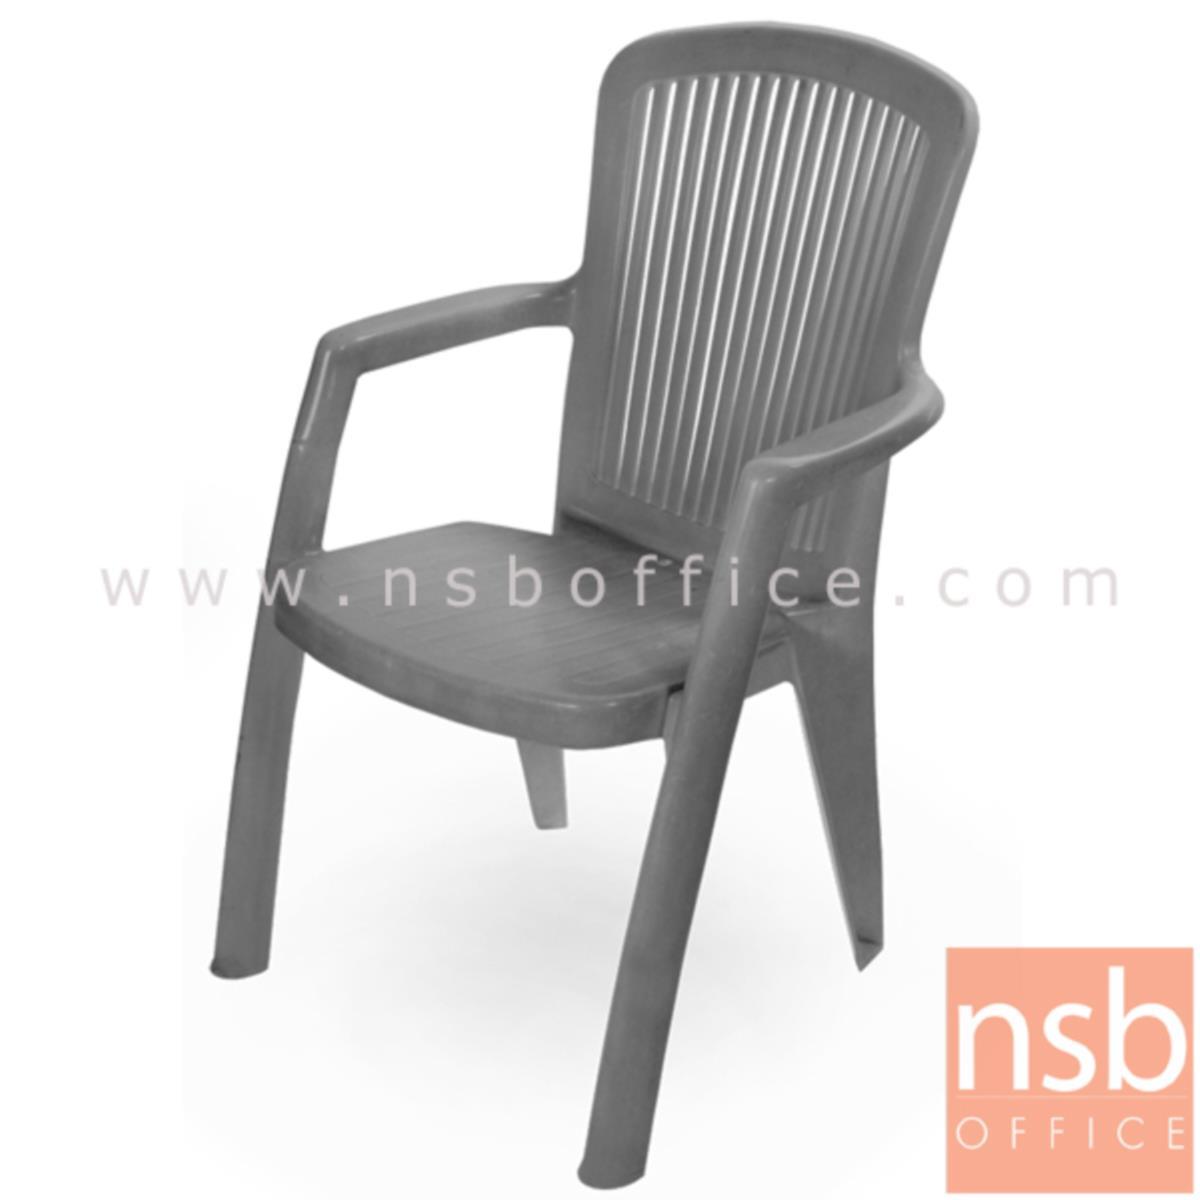 B29A059:เก้าอี้โมเดิร์นพลาสติกโพลี่ล้วน(PP) รุ่น PP9054 ขนาด 57W cm.